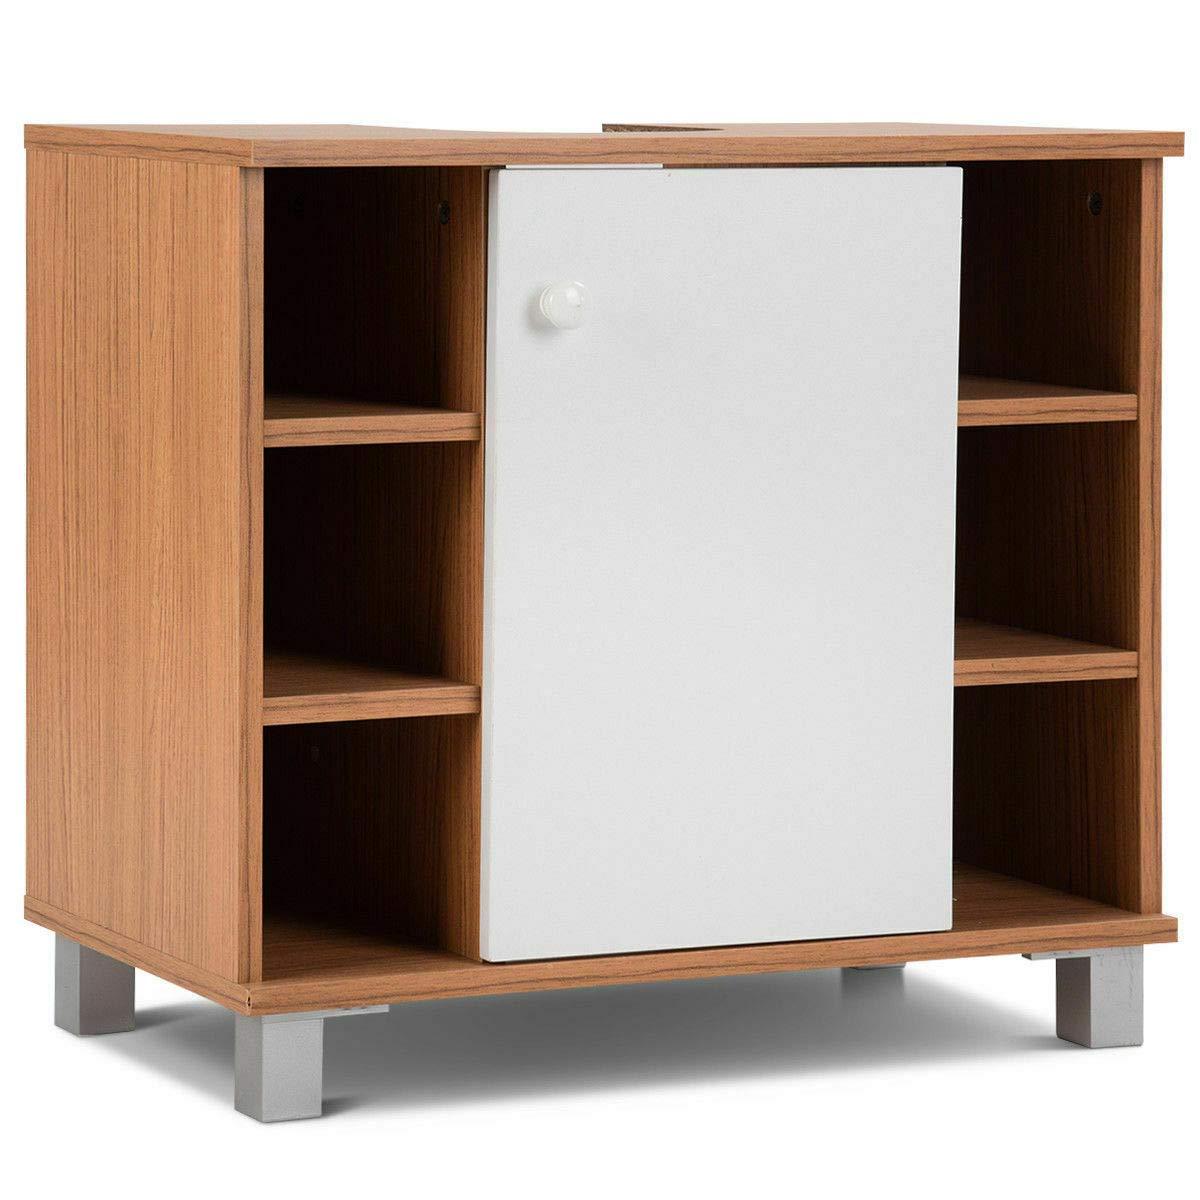 Hight Quality Under Sink 6 Cube Cabinet Bathroom Spacesaver Storage Cabinet Vanity Organizer #FDNH